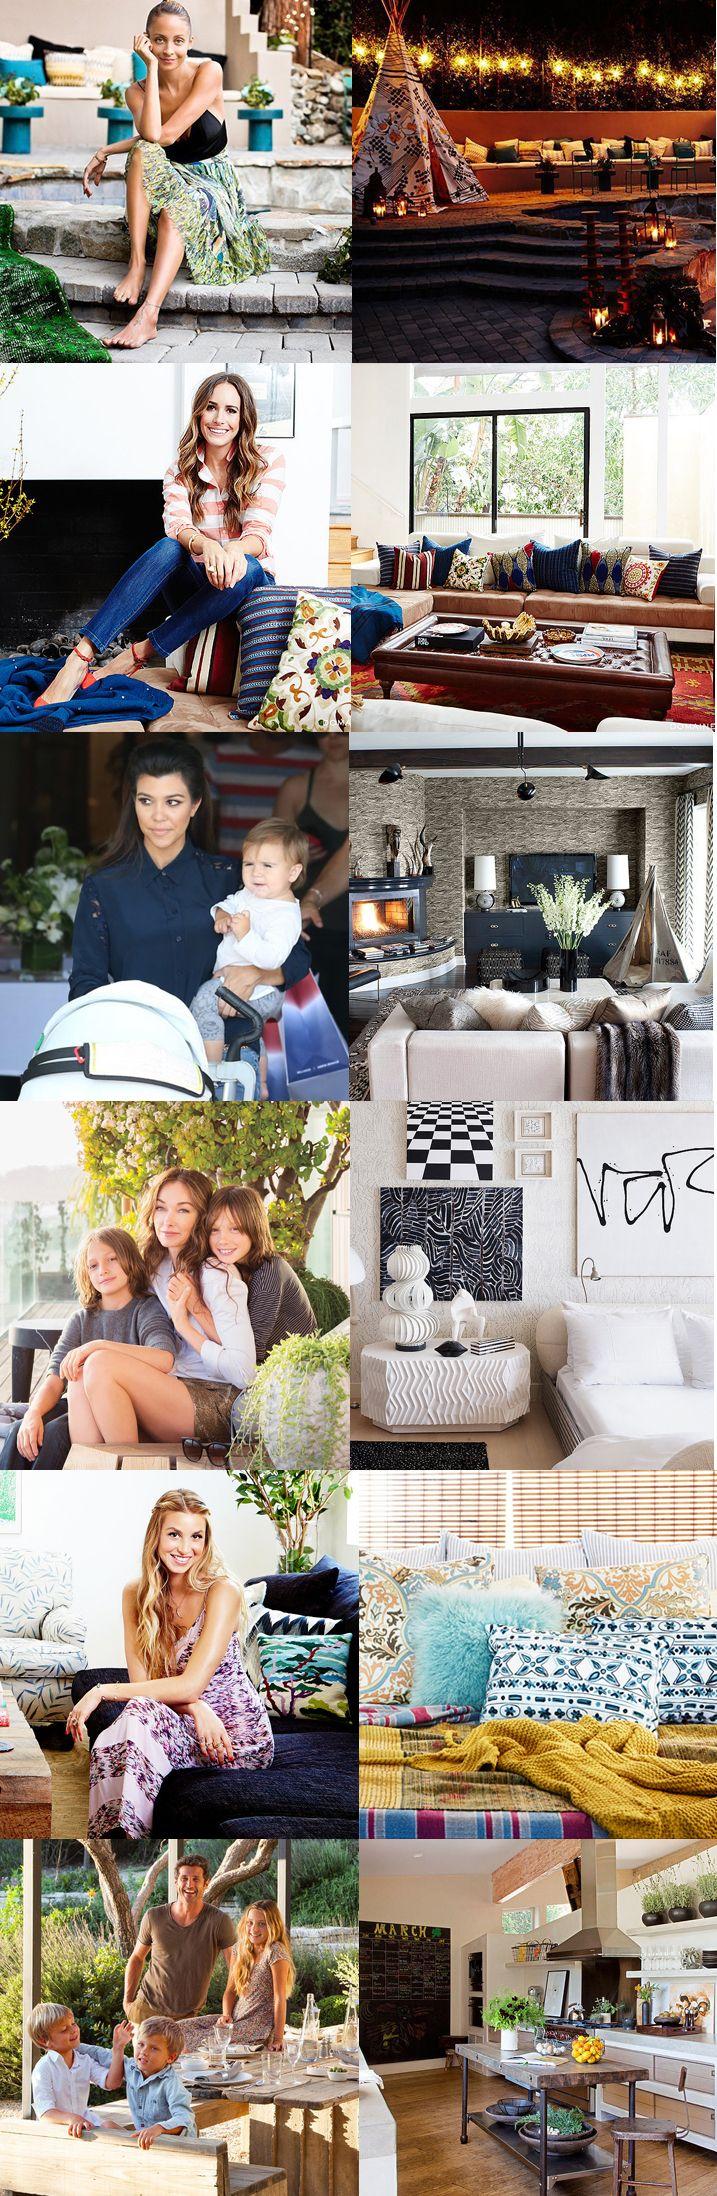 215 best celebrity homes images on pinterest celebrities homes